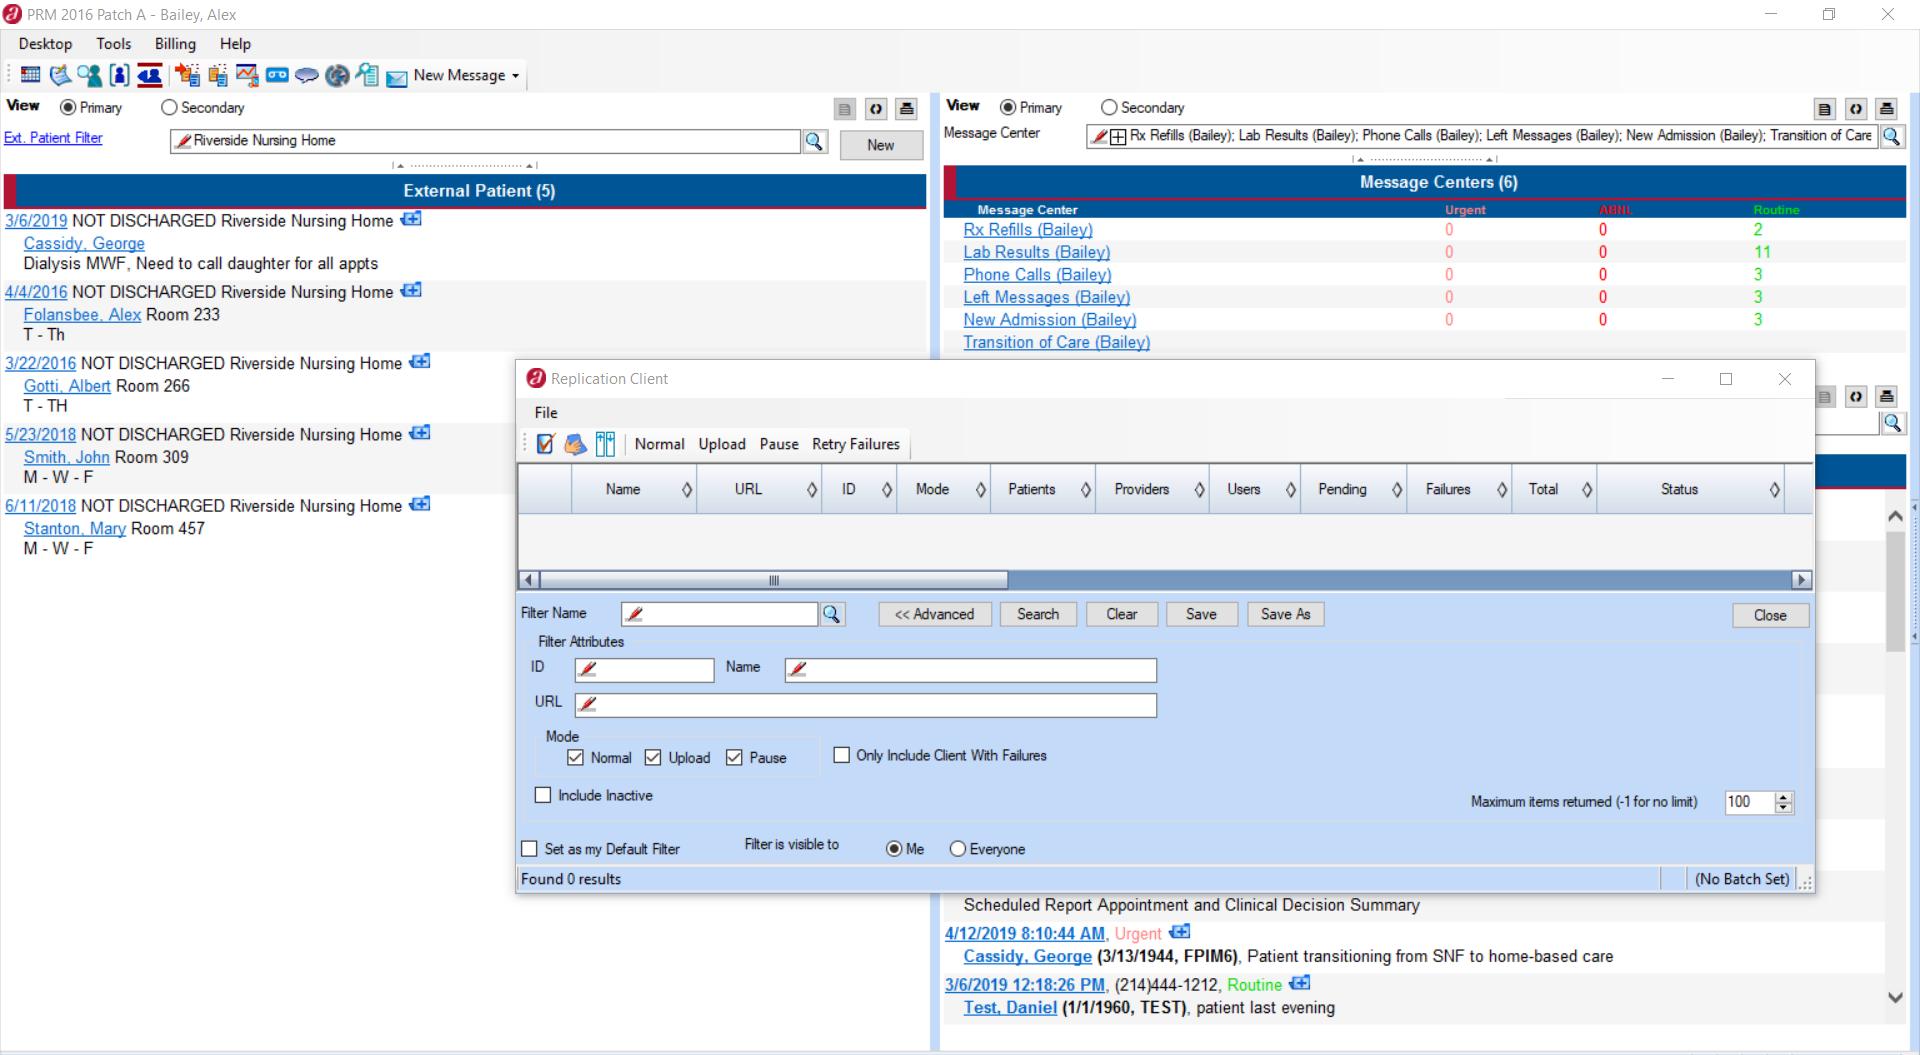 eMDs Aprima Software - 4